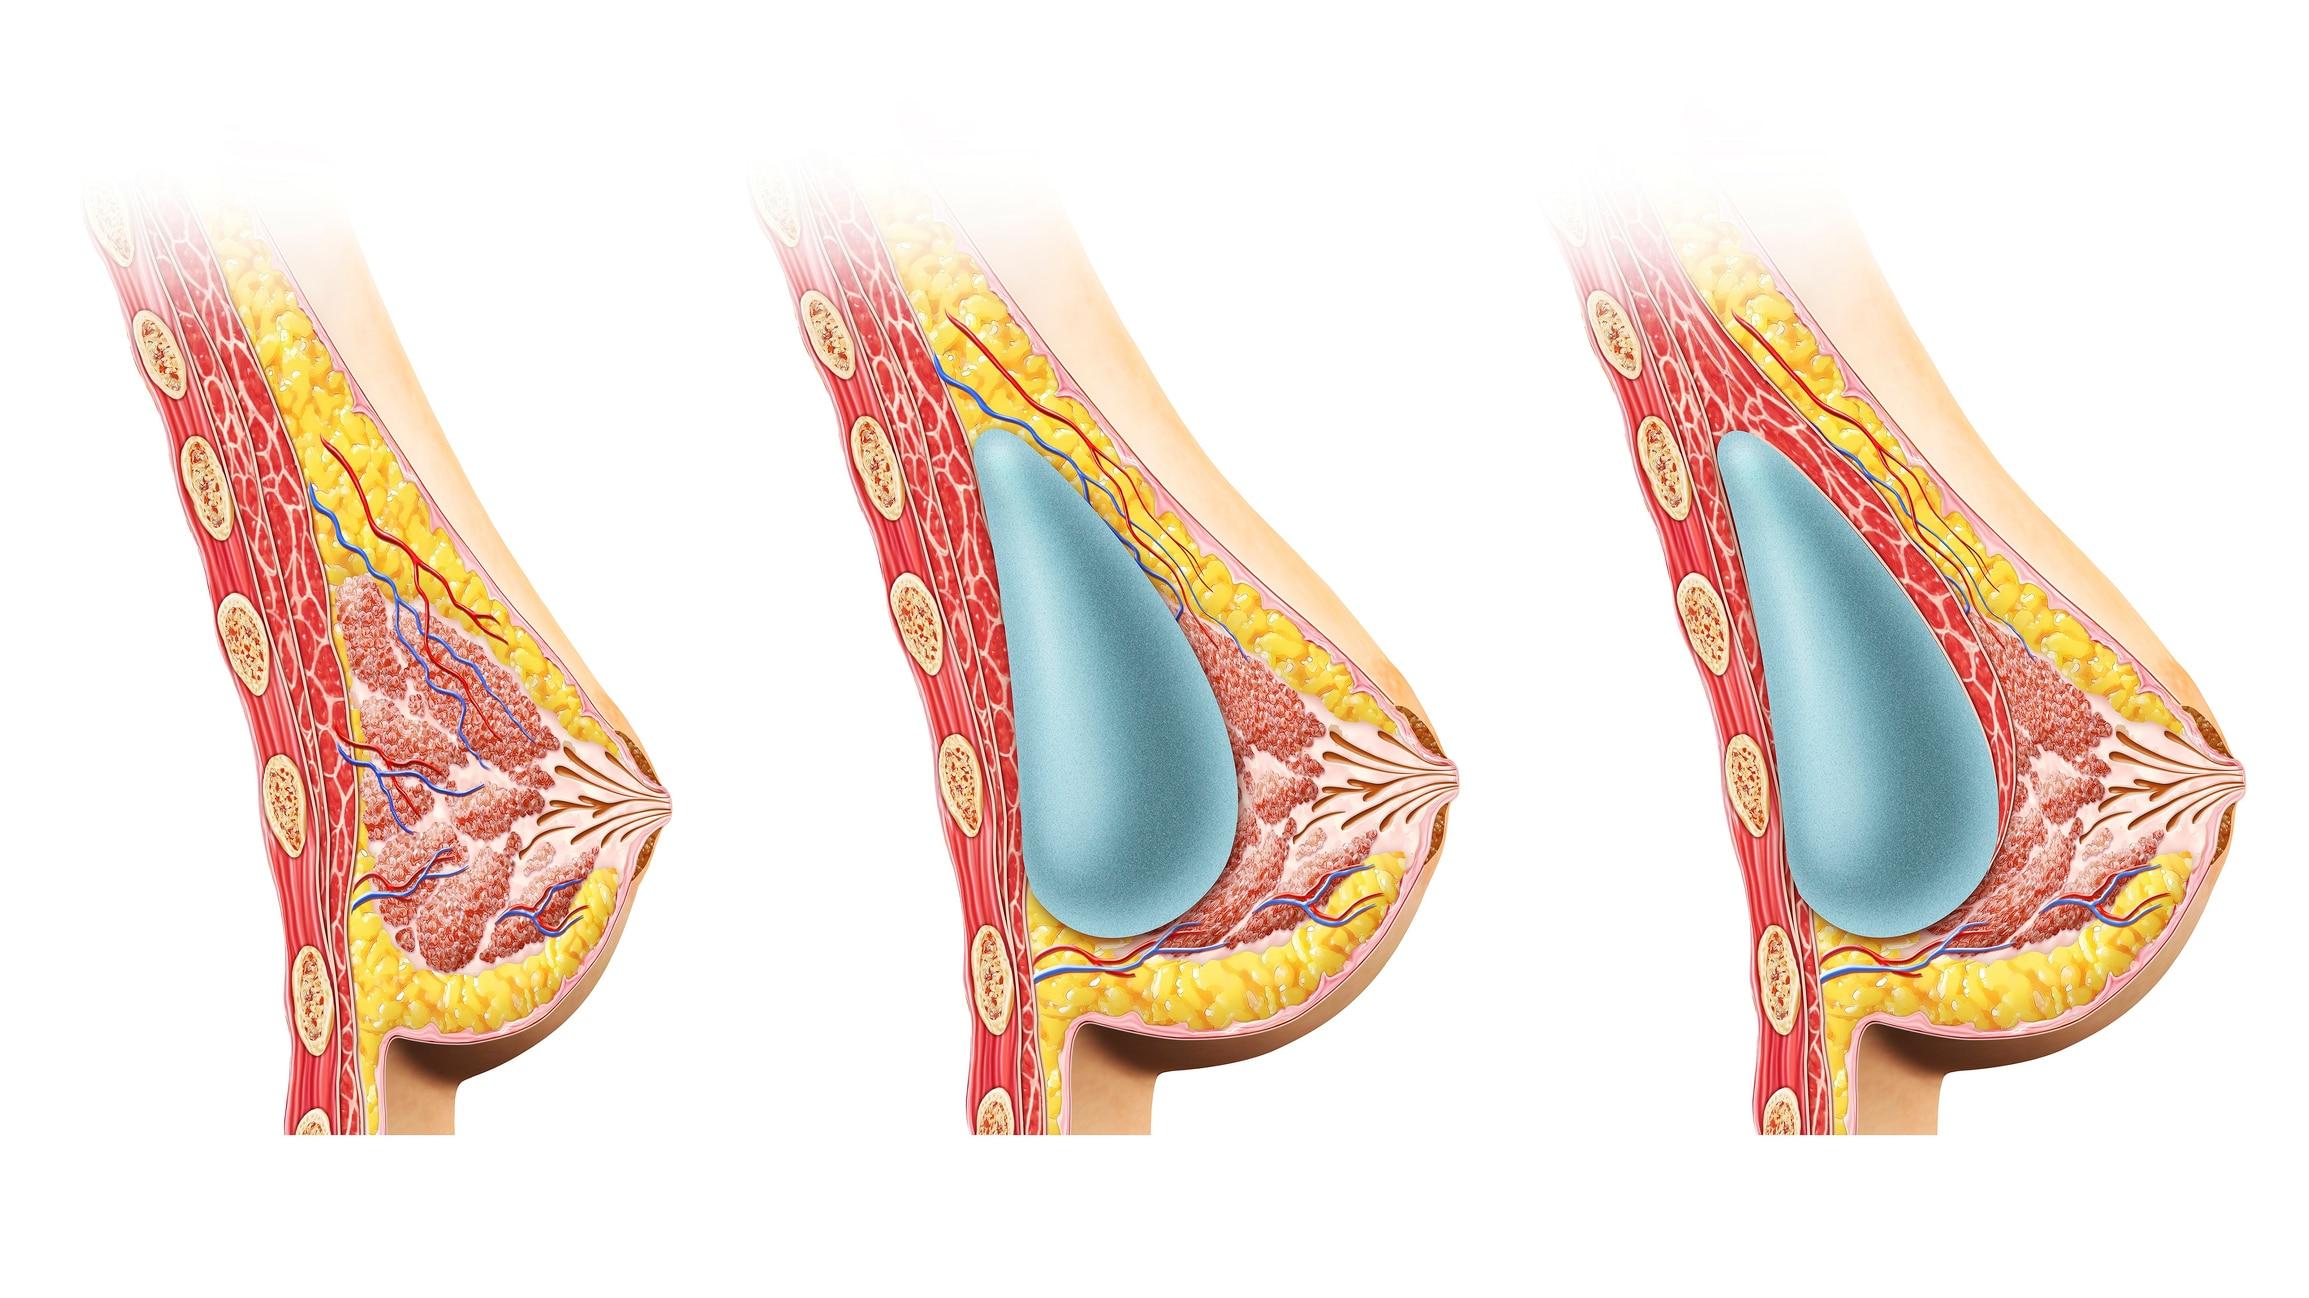 Female breast implant graphics